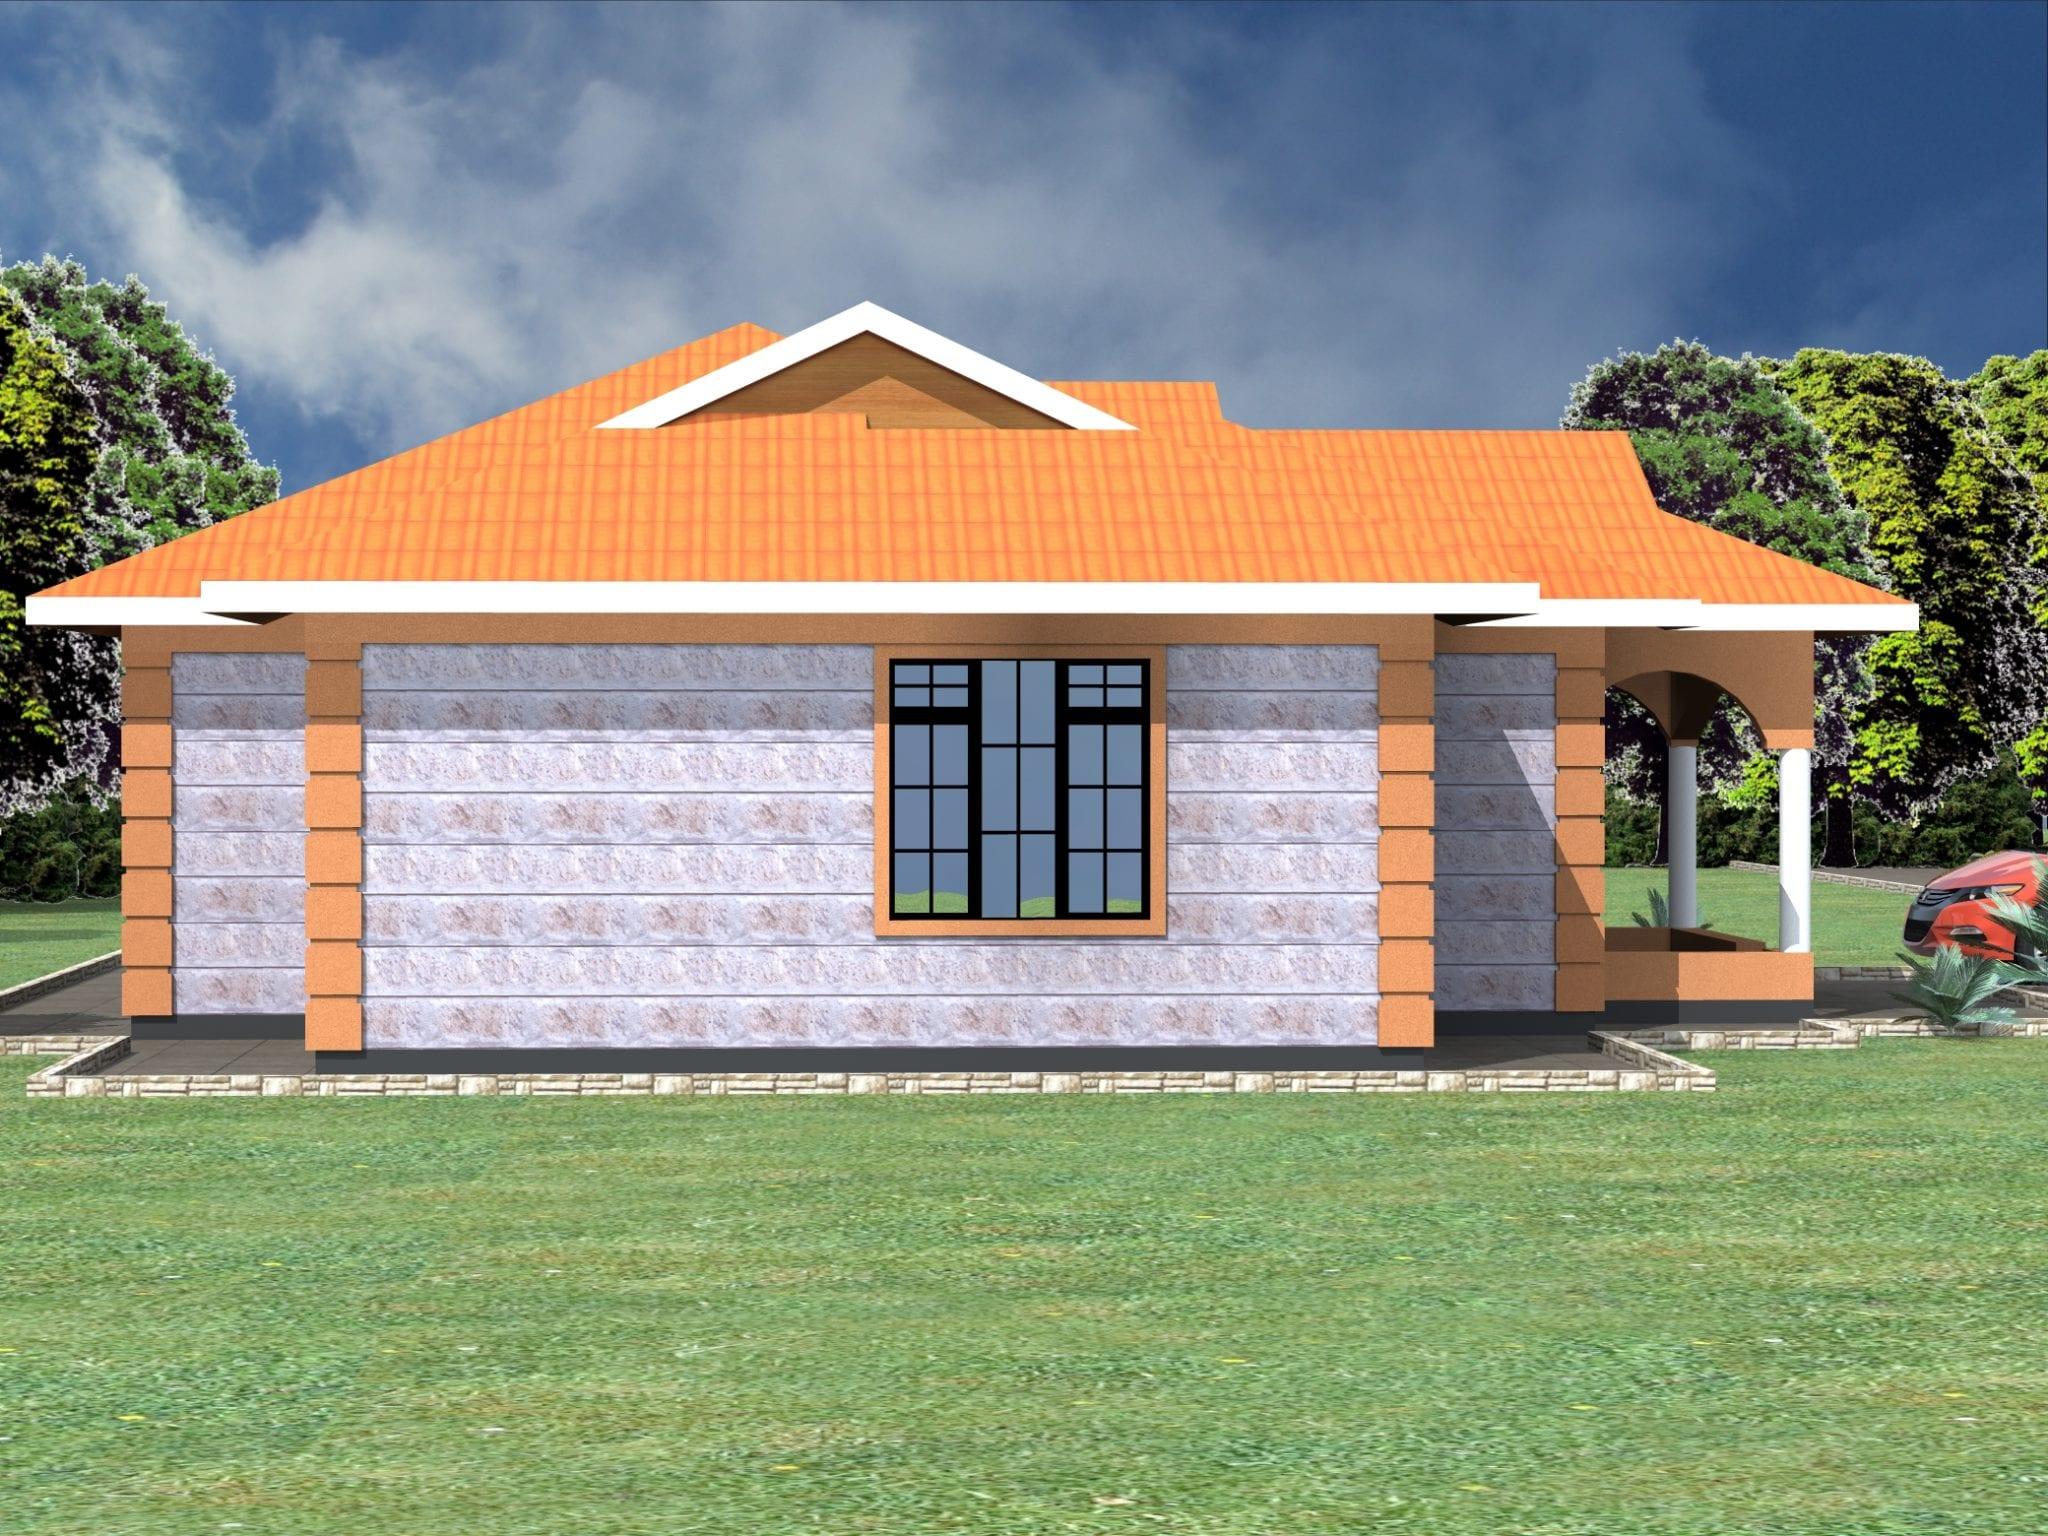 Simple 3 bedroom house plans in kenya |HPD Consult